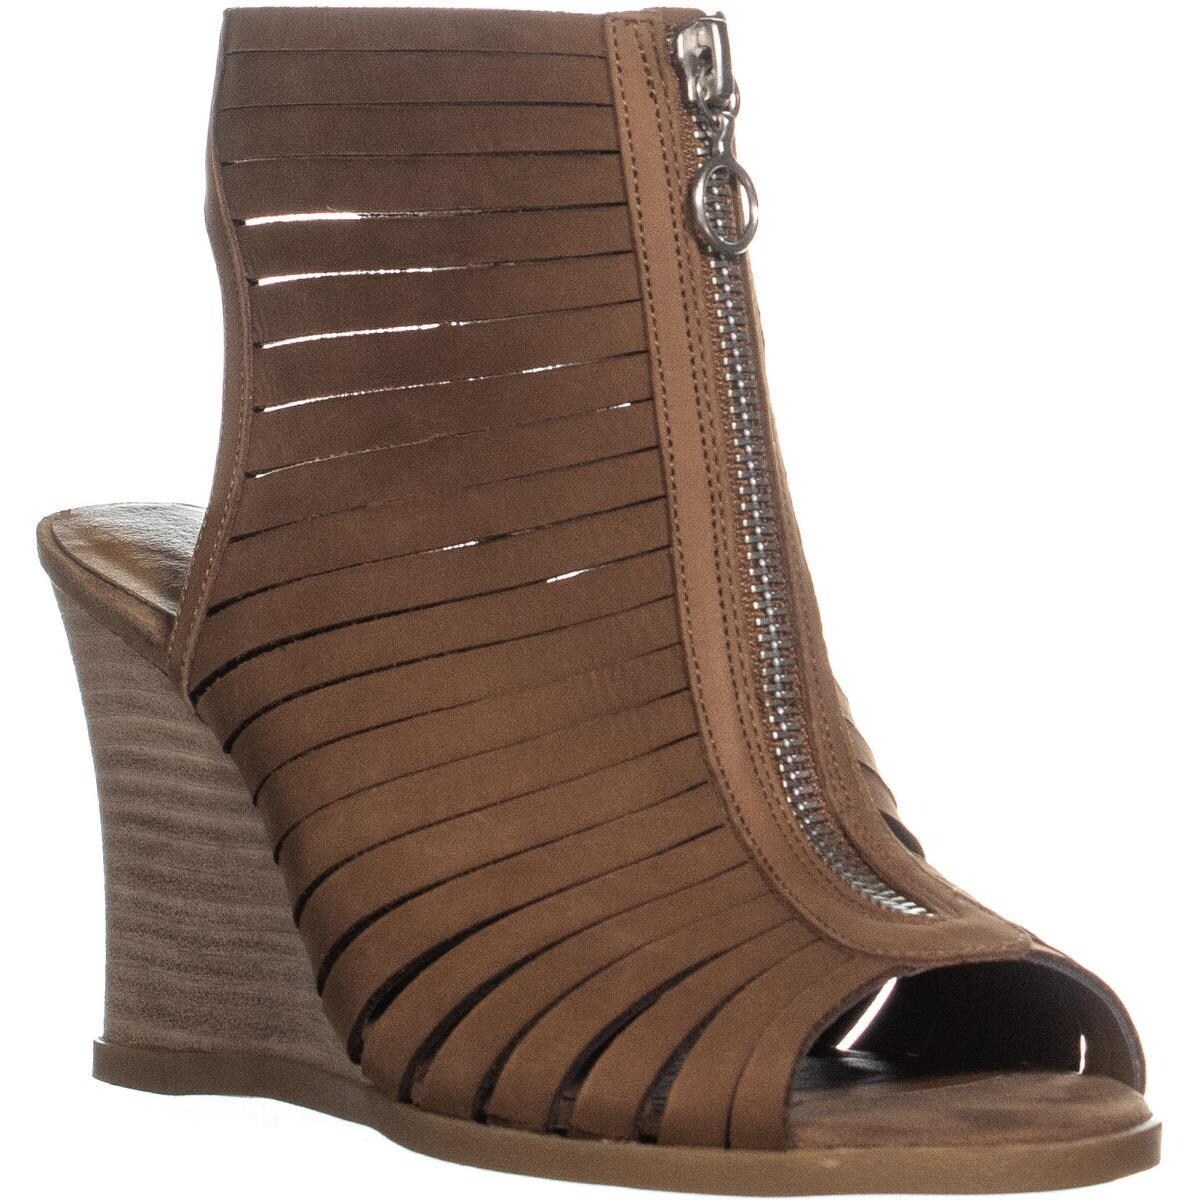 74efbe5f0a3 Denim & Supply Ralph Lauren Starr Wedge Sandals, Tan - 9 us / 40 eu